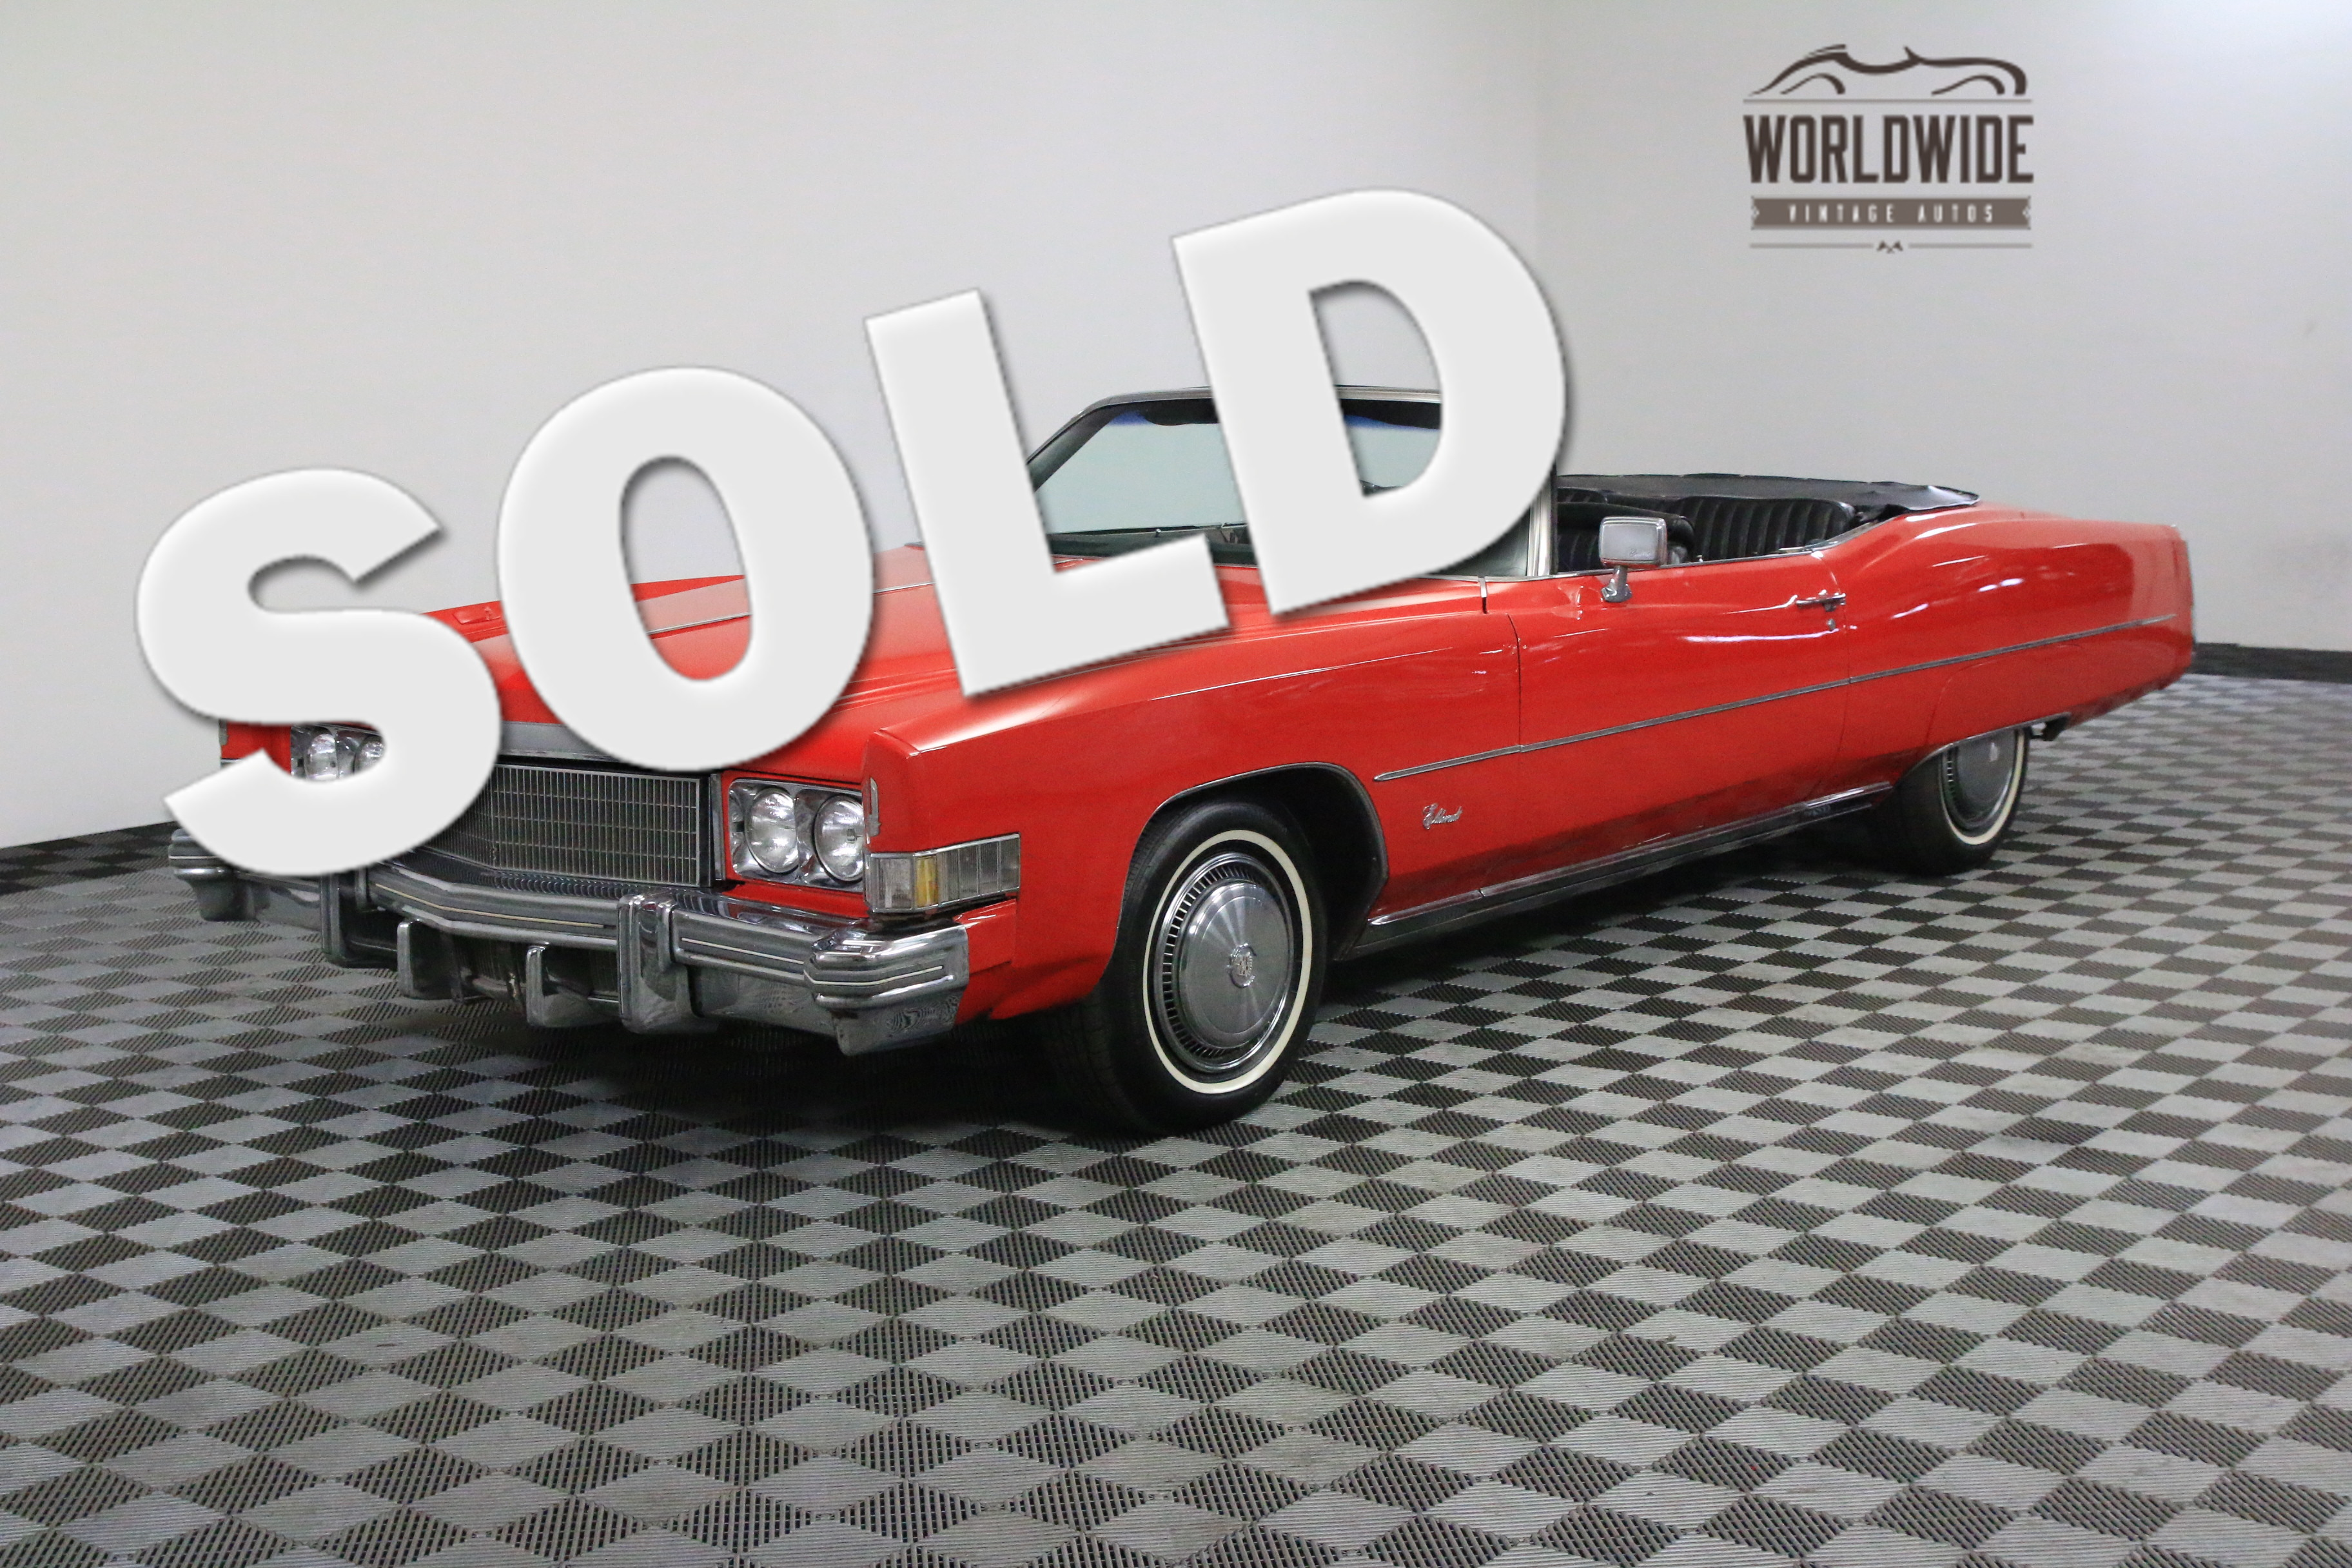 1974 Cadillac ELDORADO VEGAS SHOW CAR LOW MILES